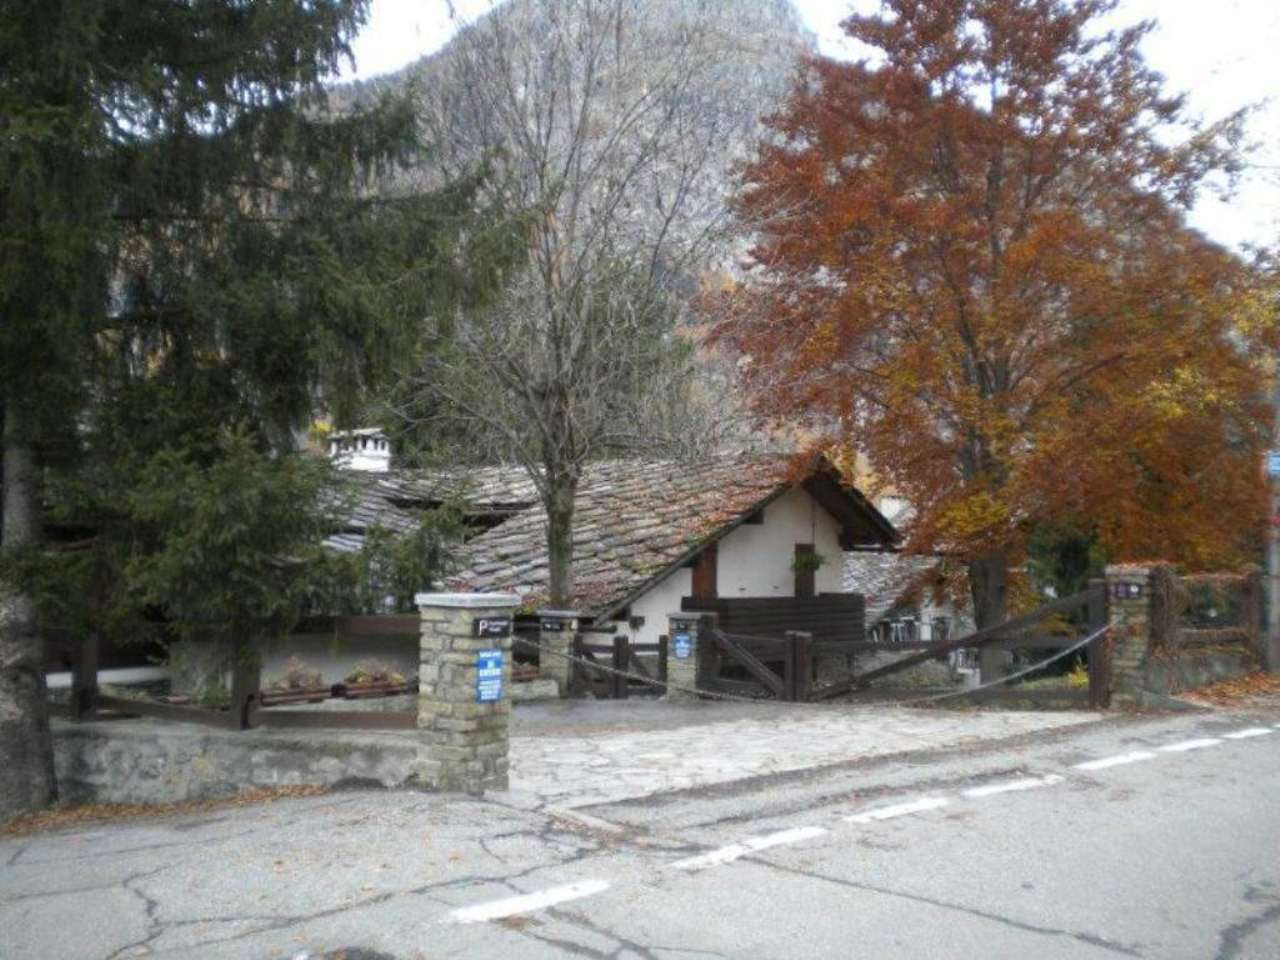 Villa in Vendita a Courmayeur: 5 locali, 450 mq - Foto 8